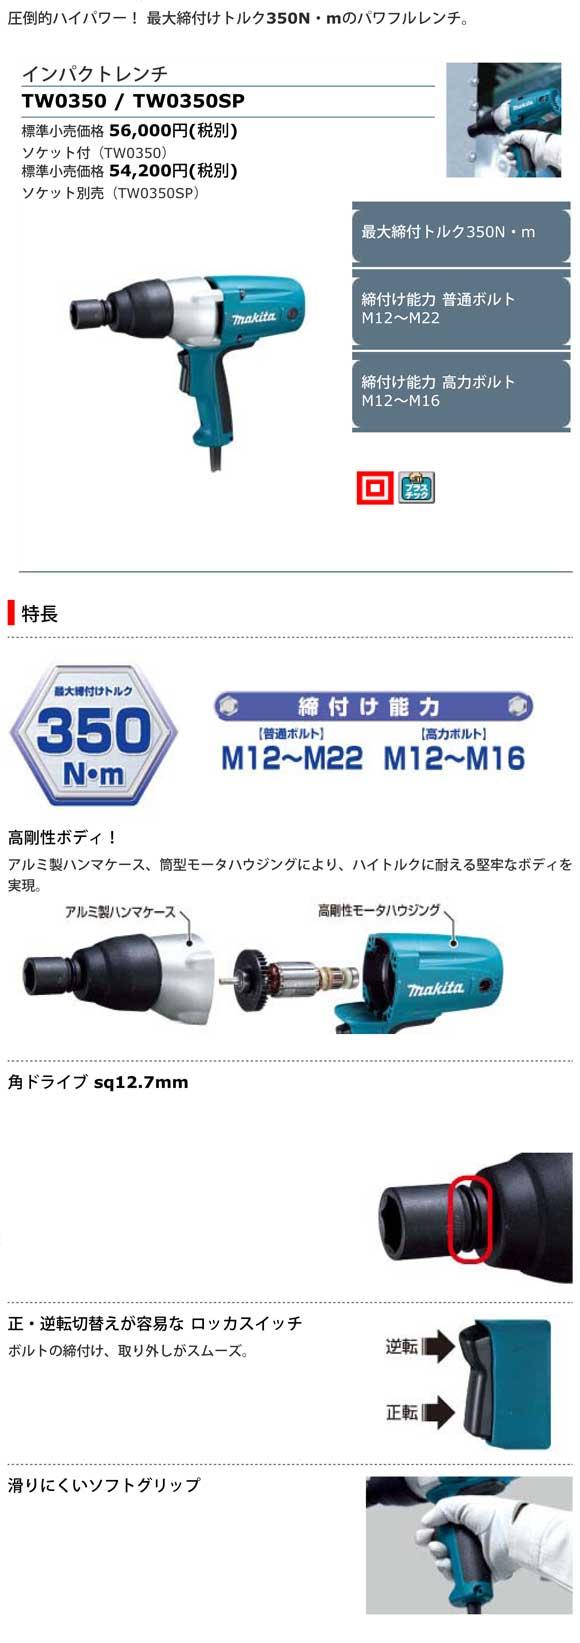 TW0350